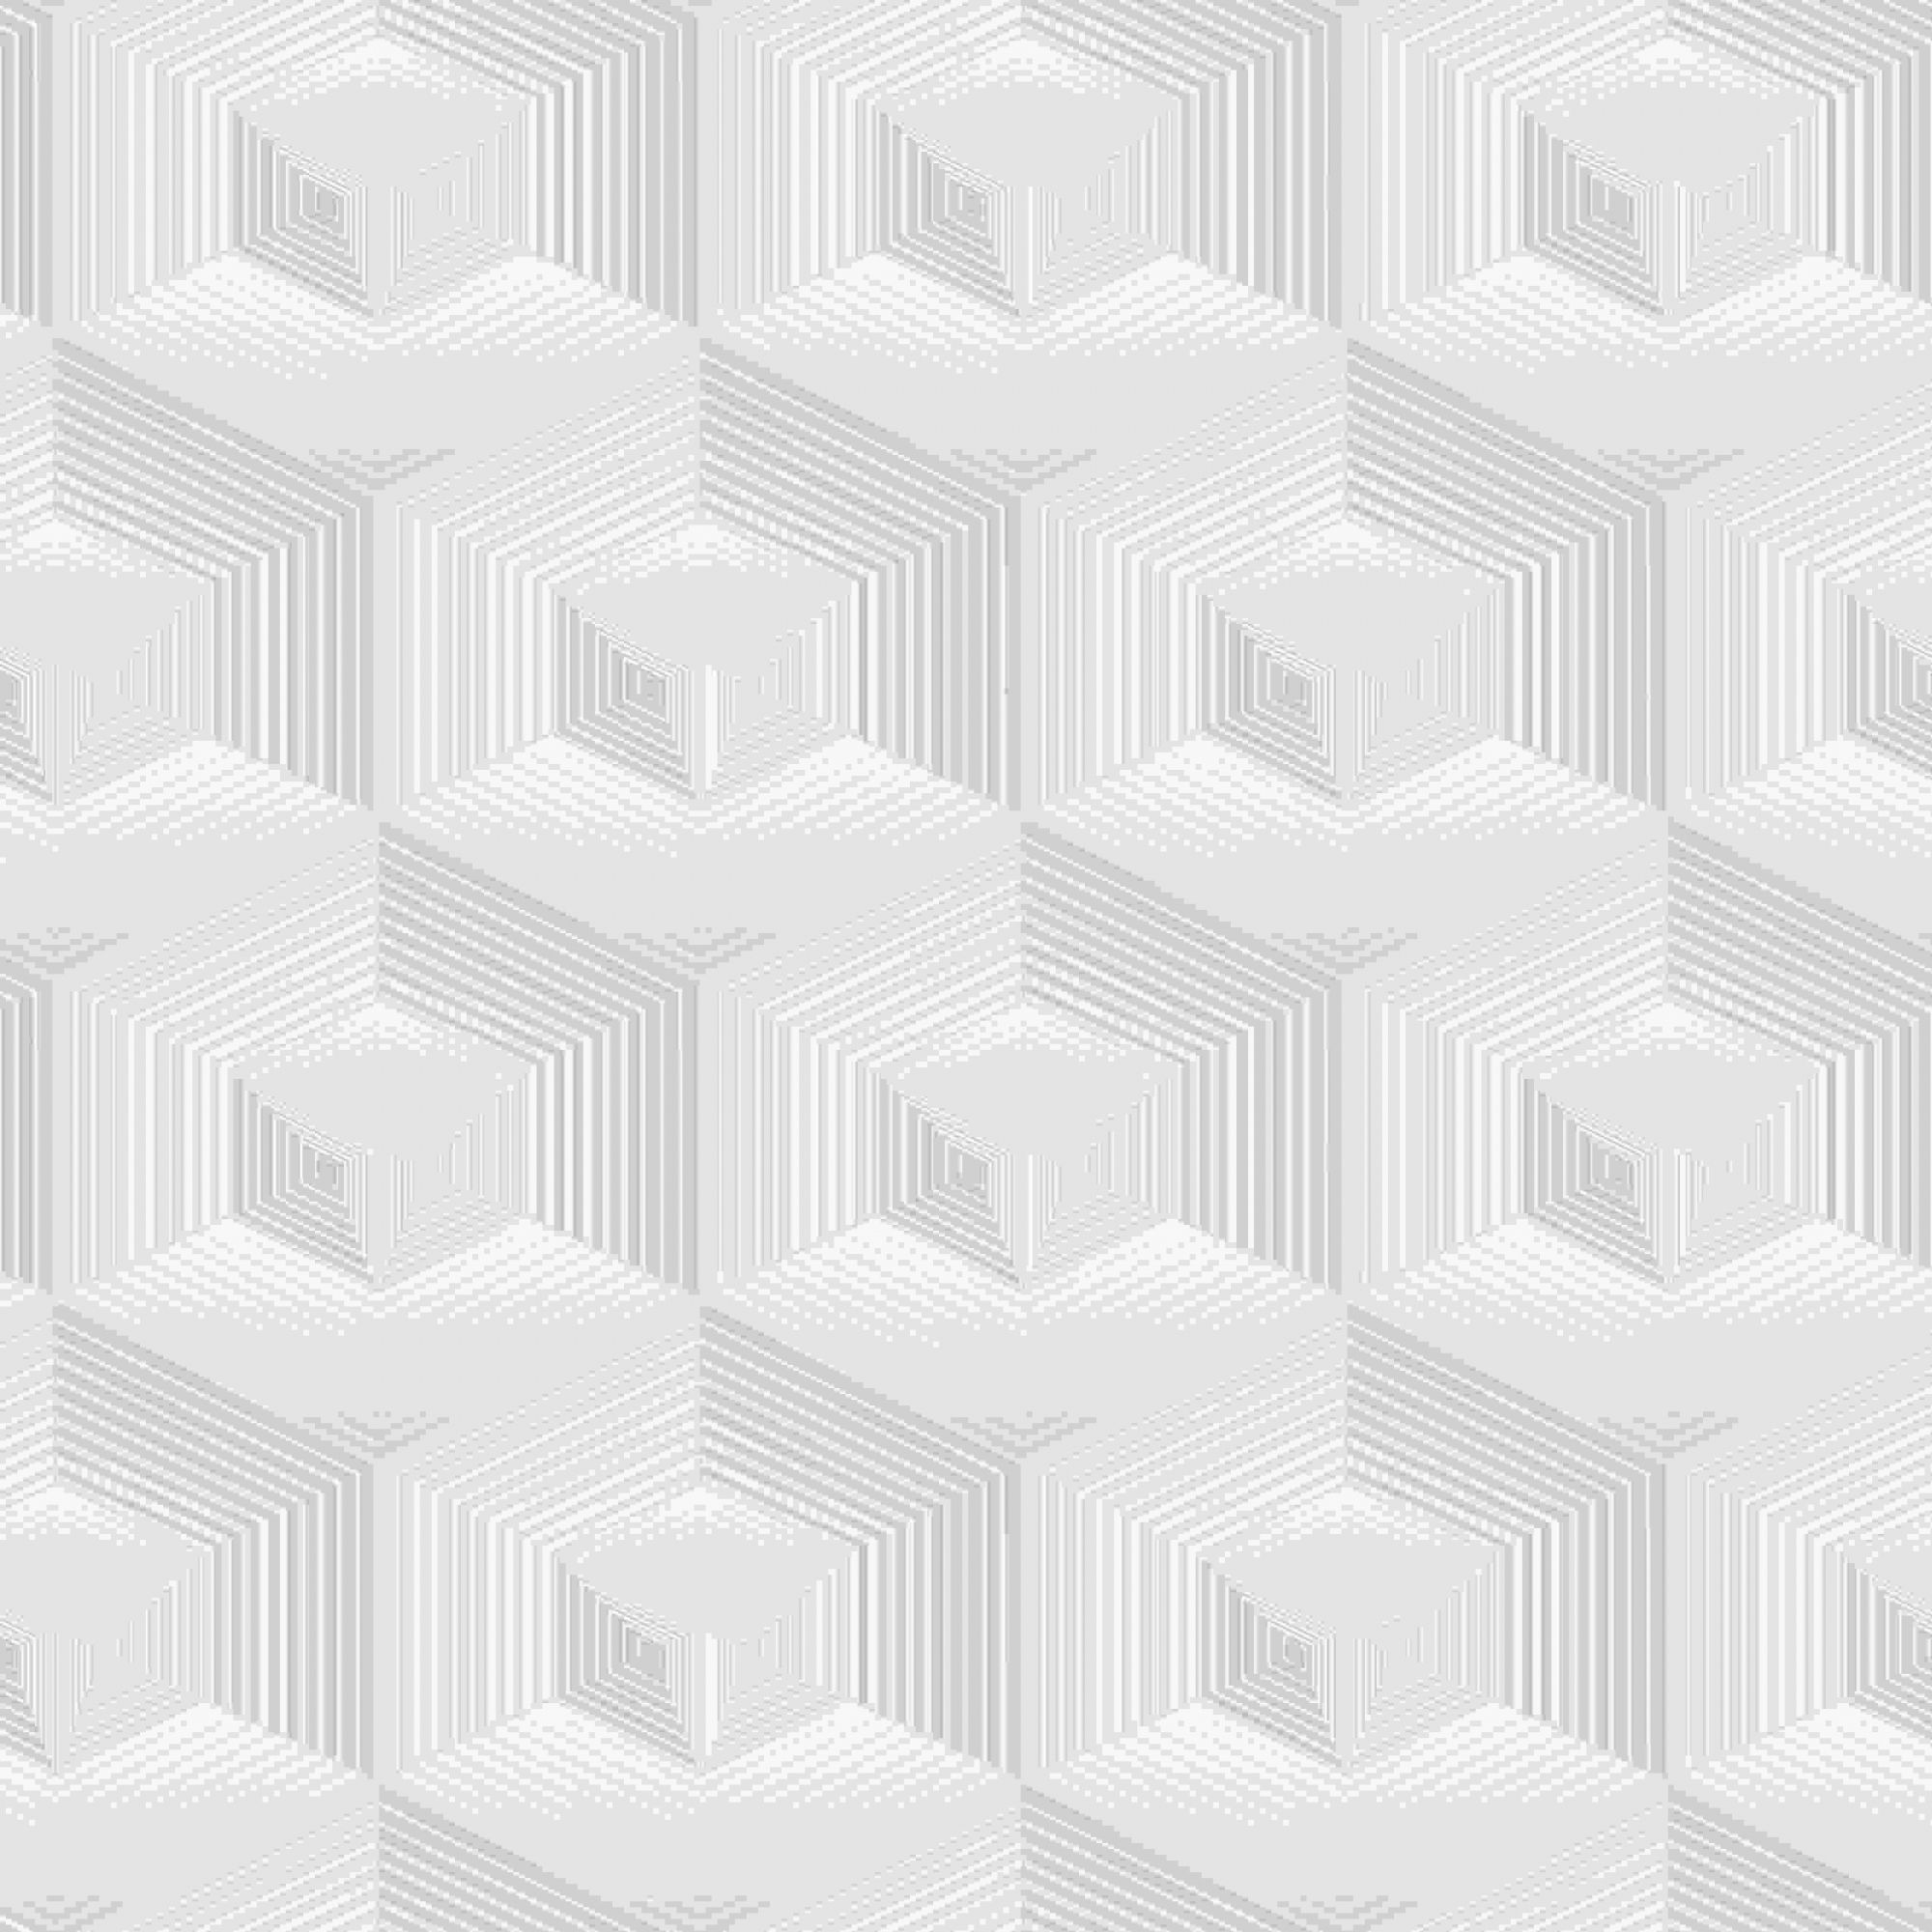 Papel de Parede Kan Tai Vinílico Coleção Neonature 5 Geométrico 3D Cinza, Bege, Off white